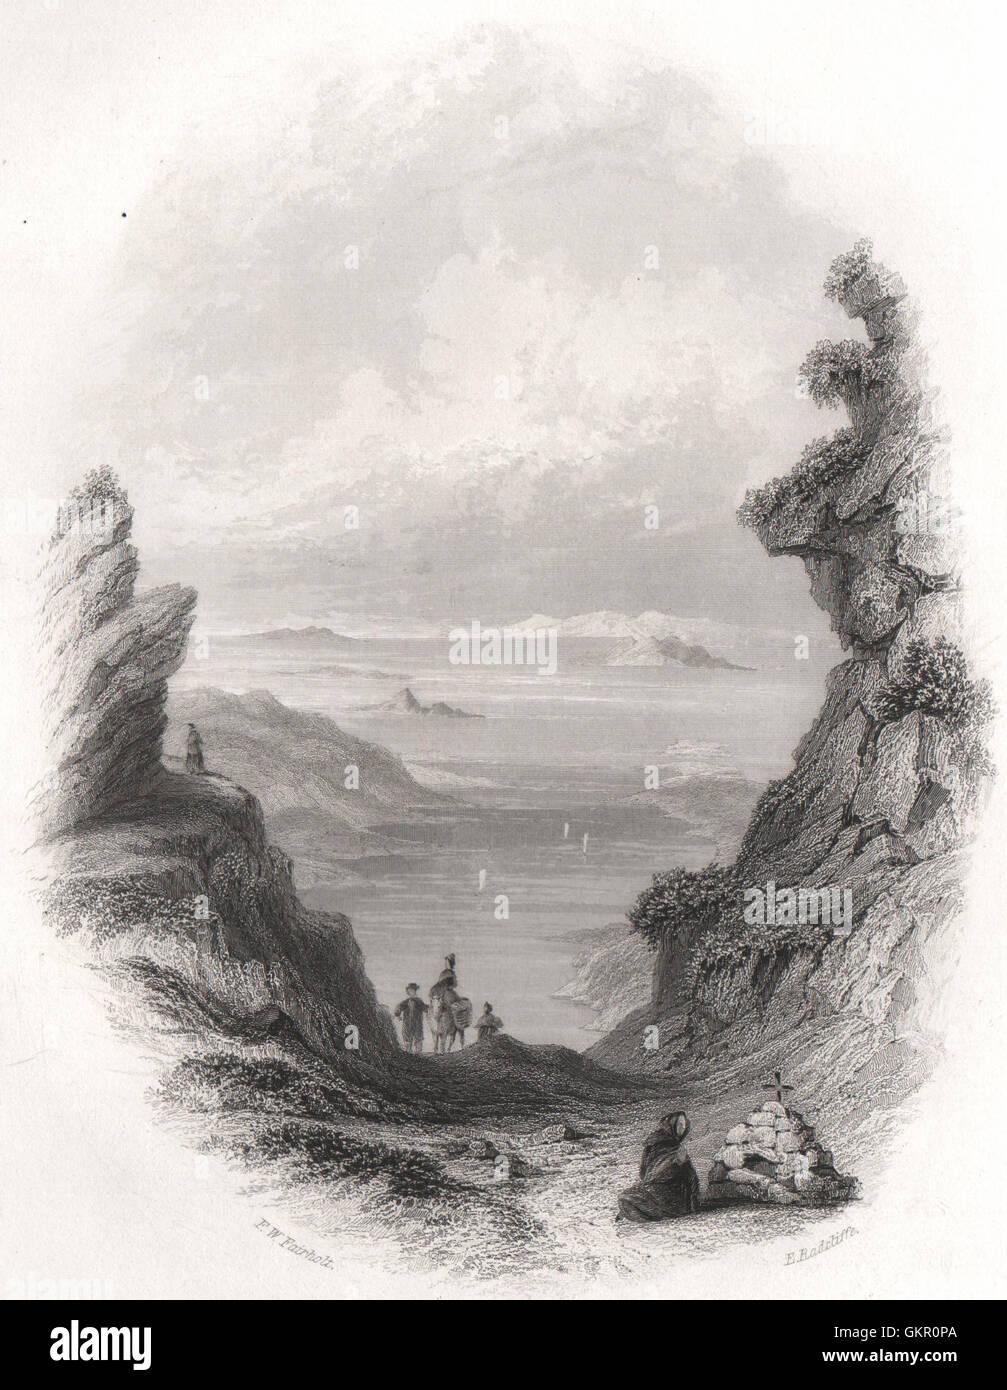 Pase de Salrock Salruc (PASS), Galway. Irlanda, grabado antiguo 1835 Imagen De Stock